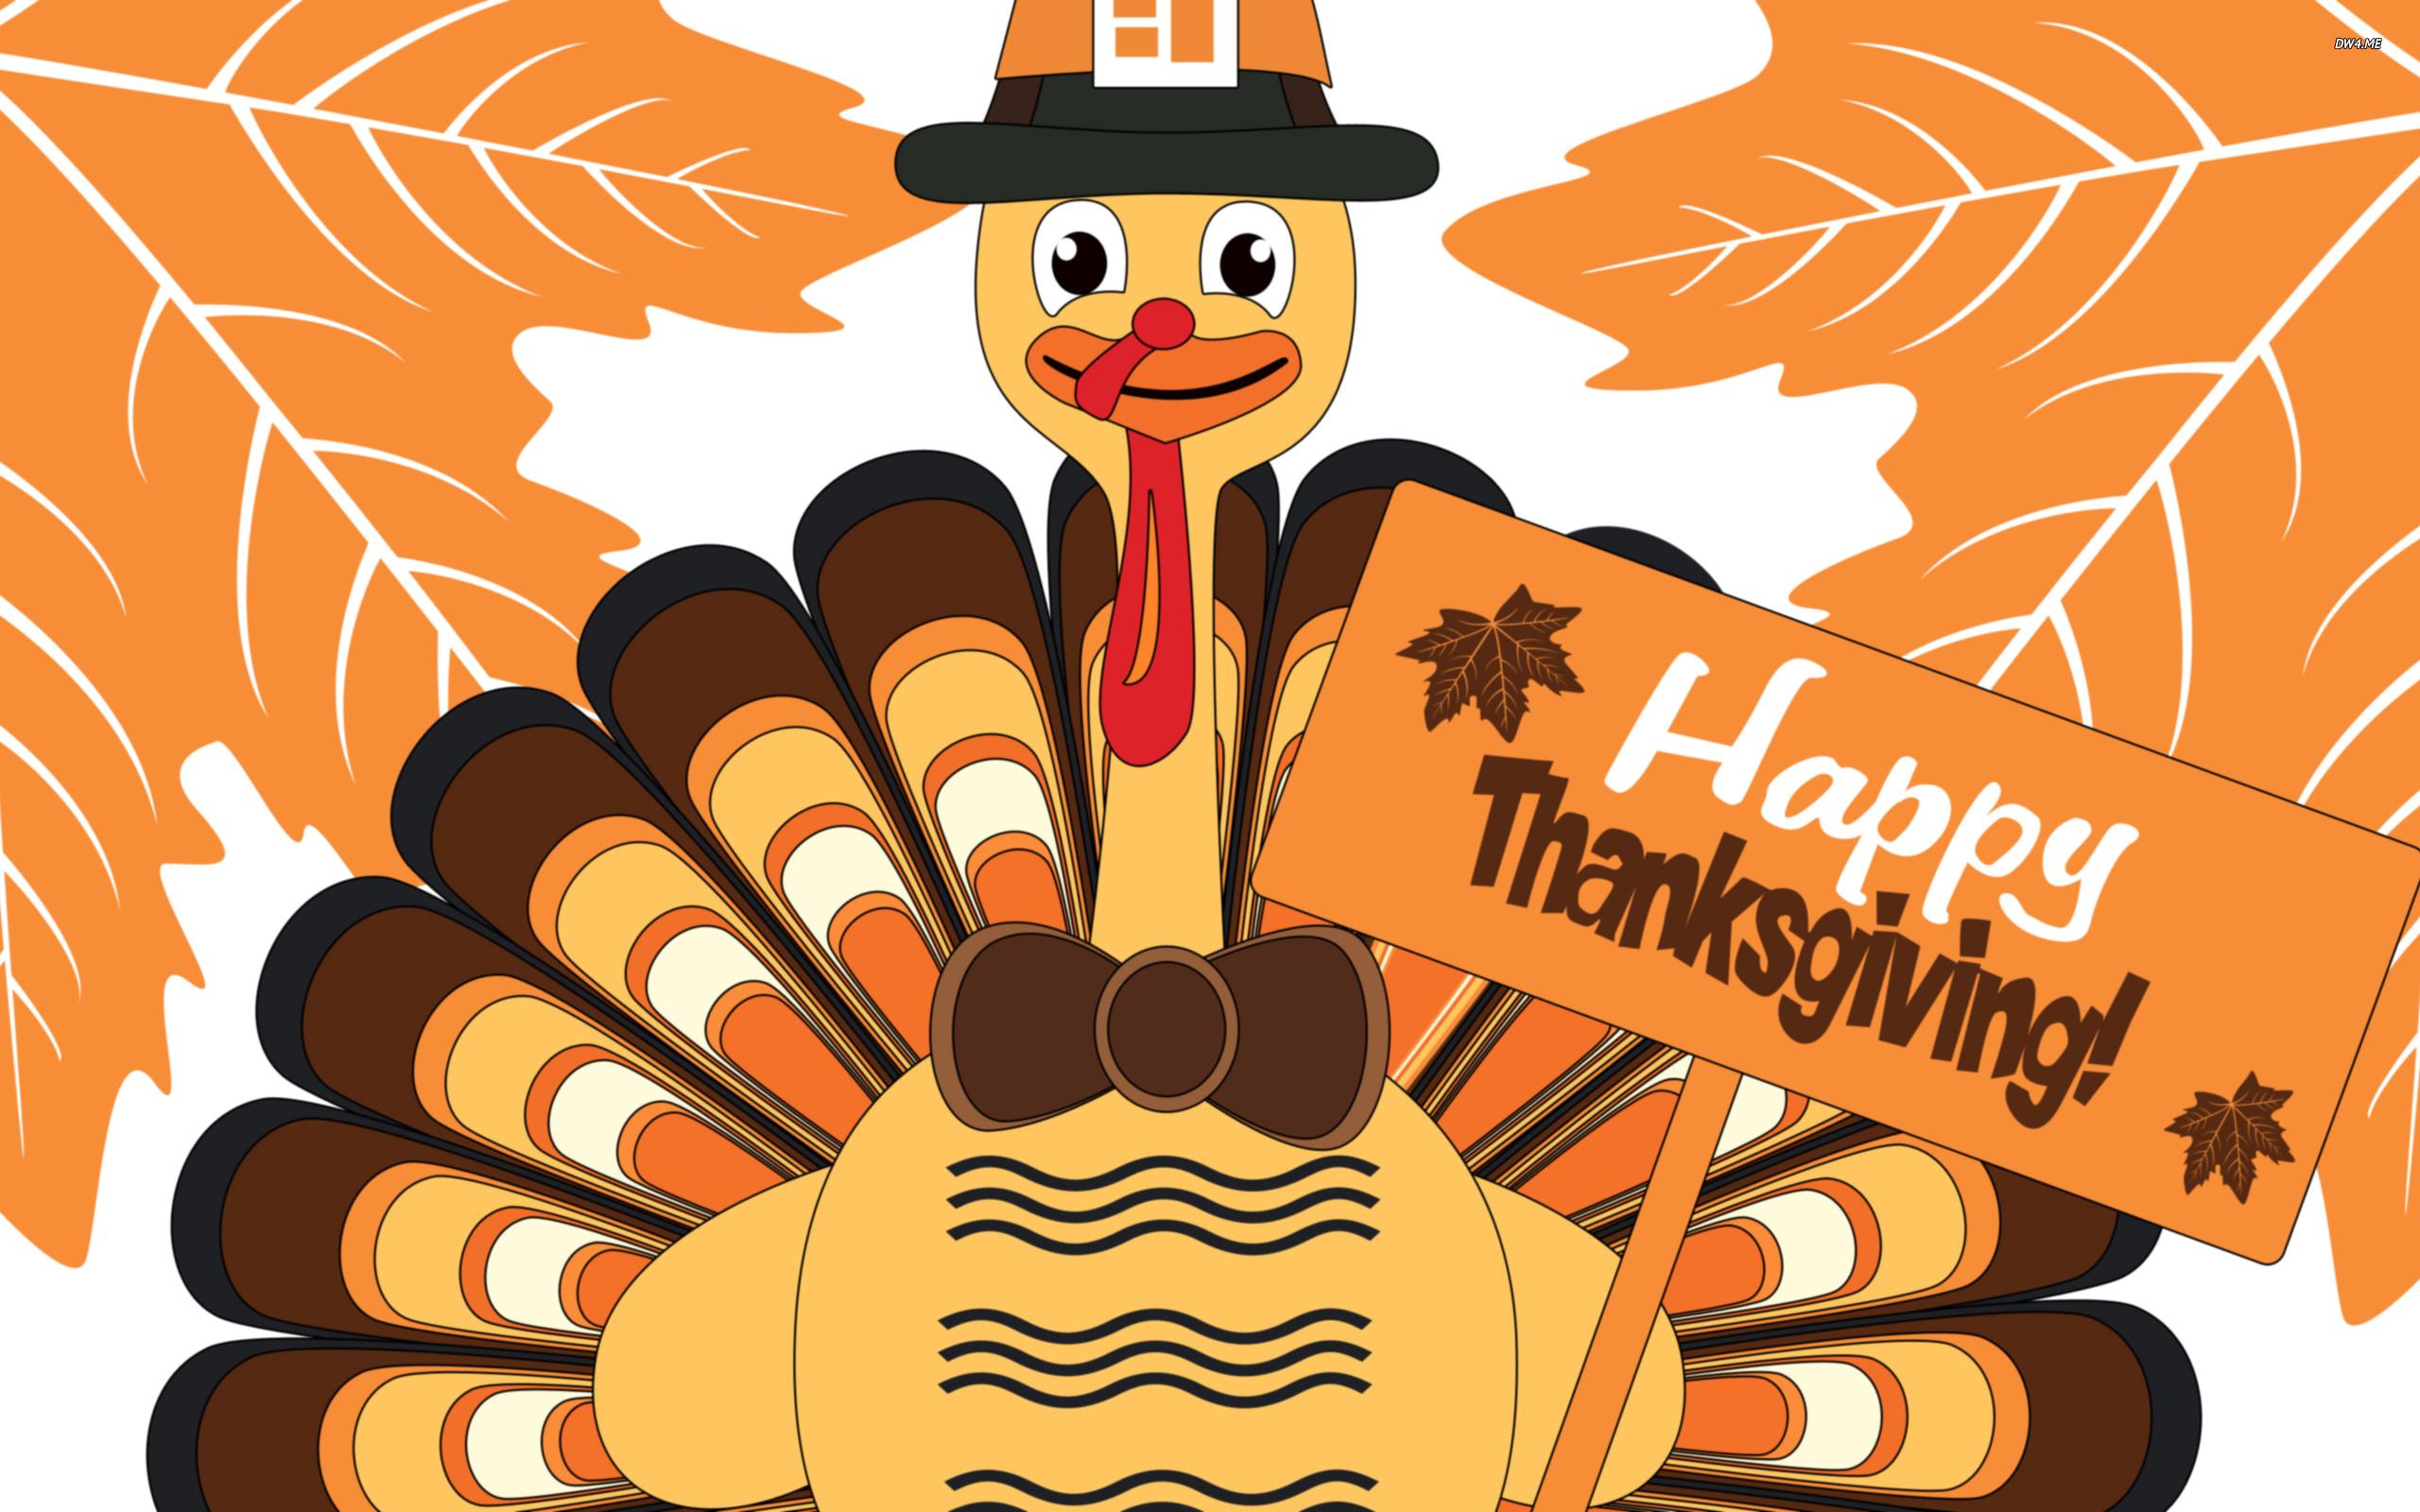 8th annual thanksgiving day - HD1440×900